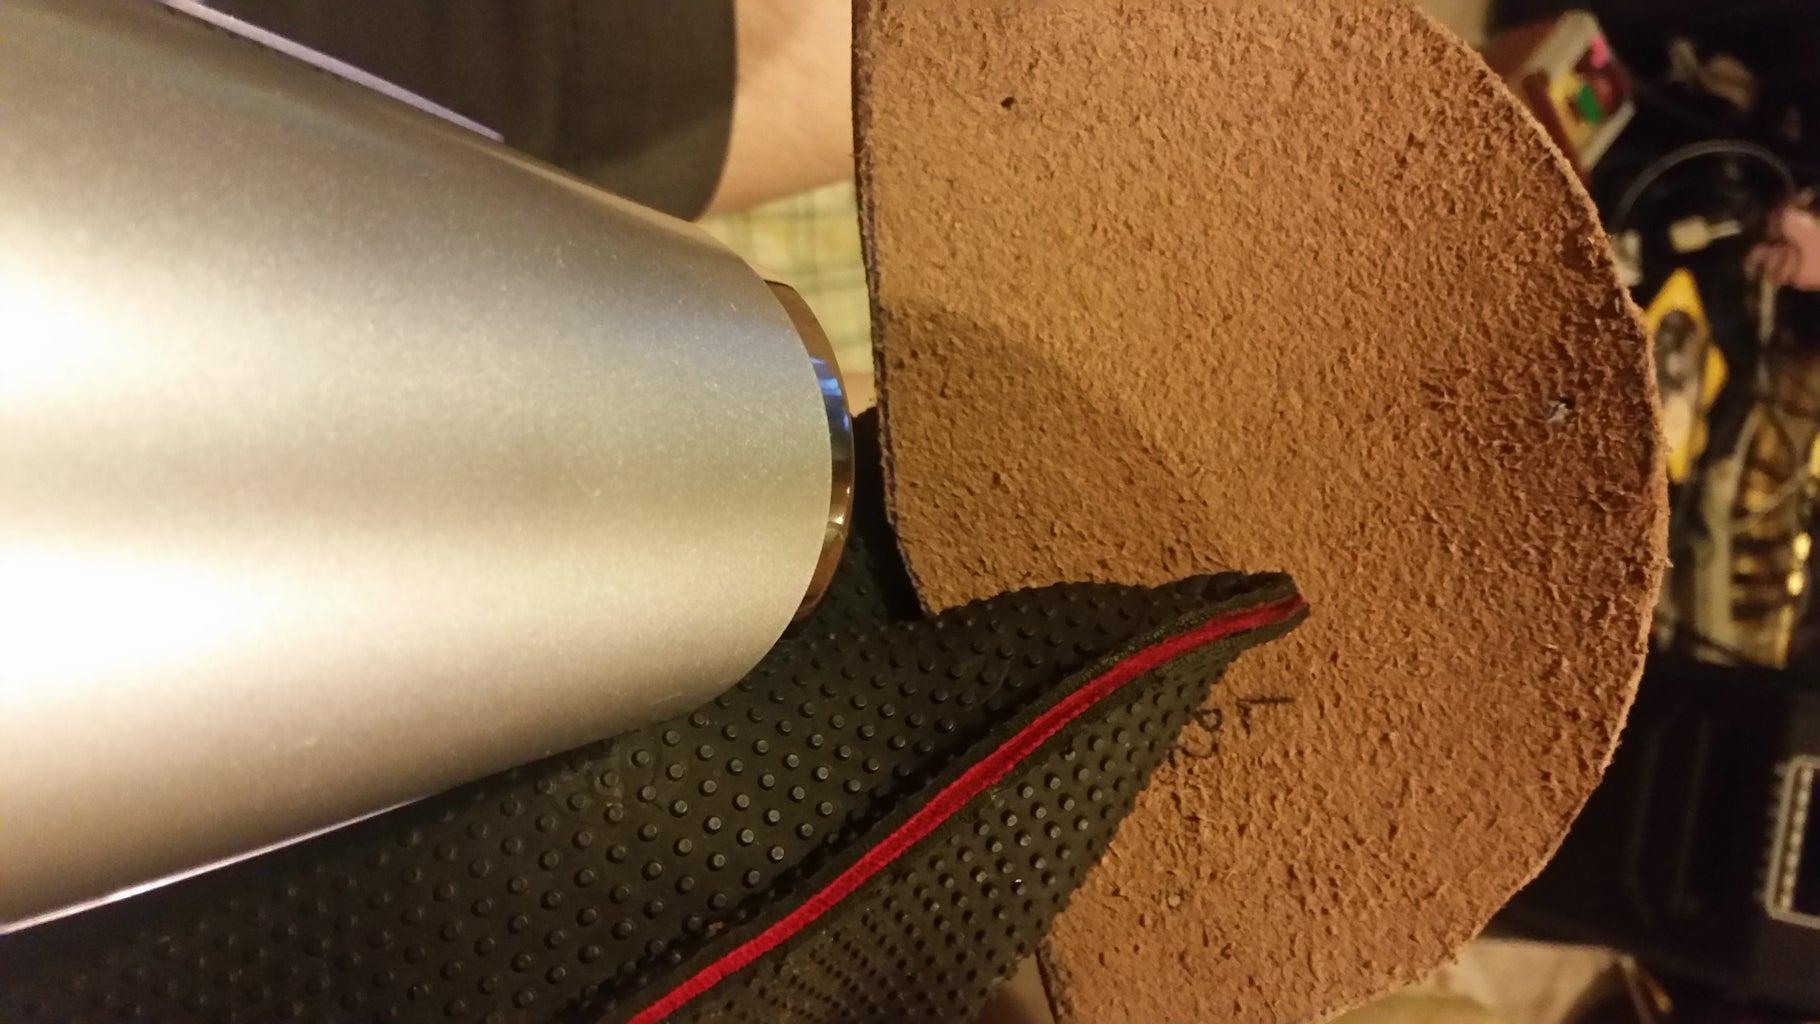 (Optional) Hardening the Leather